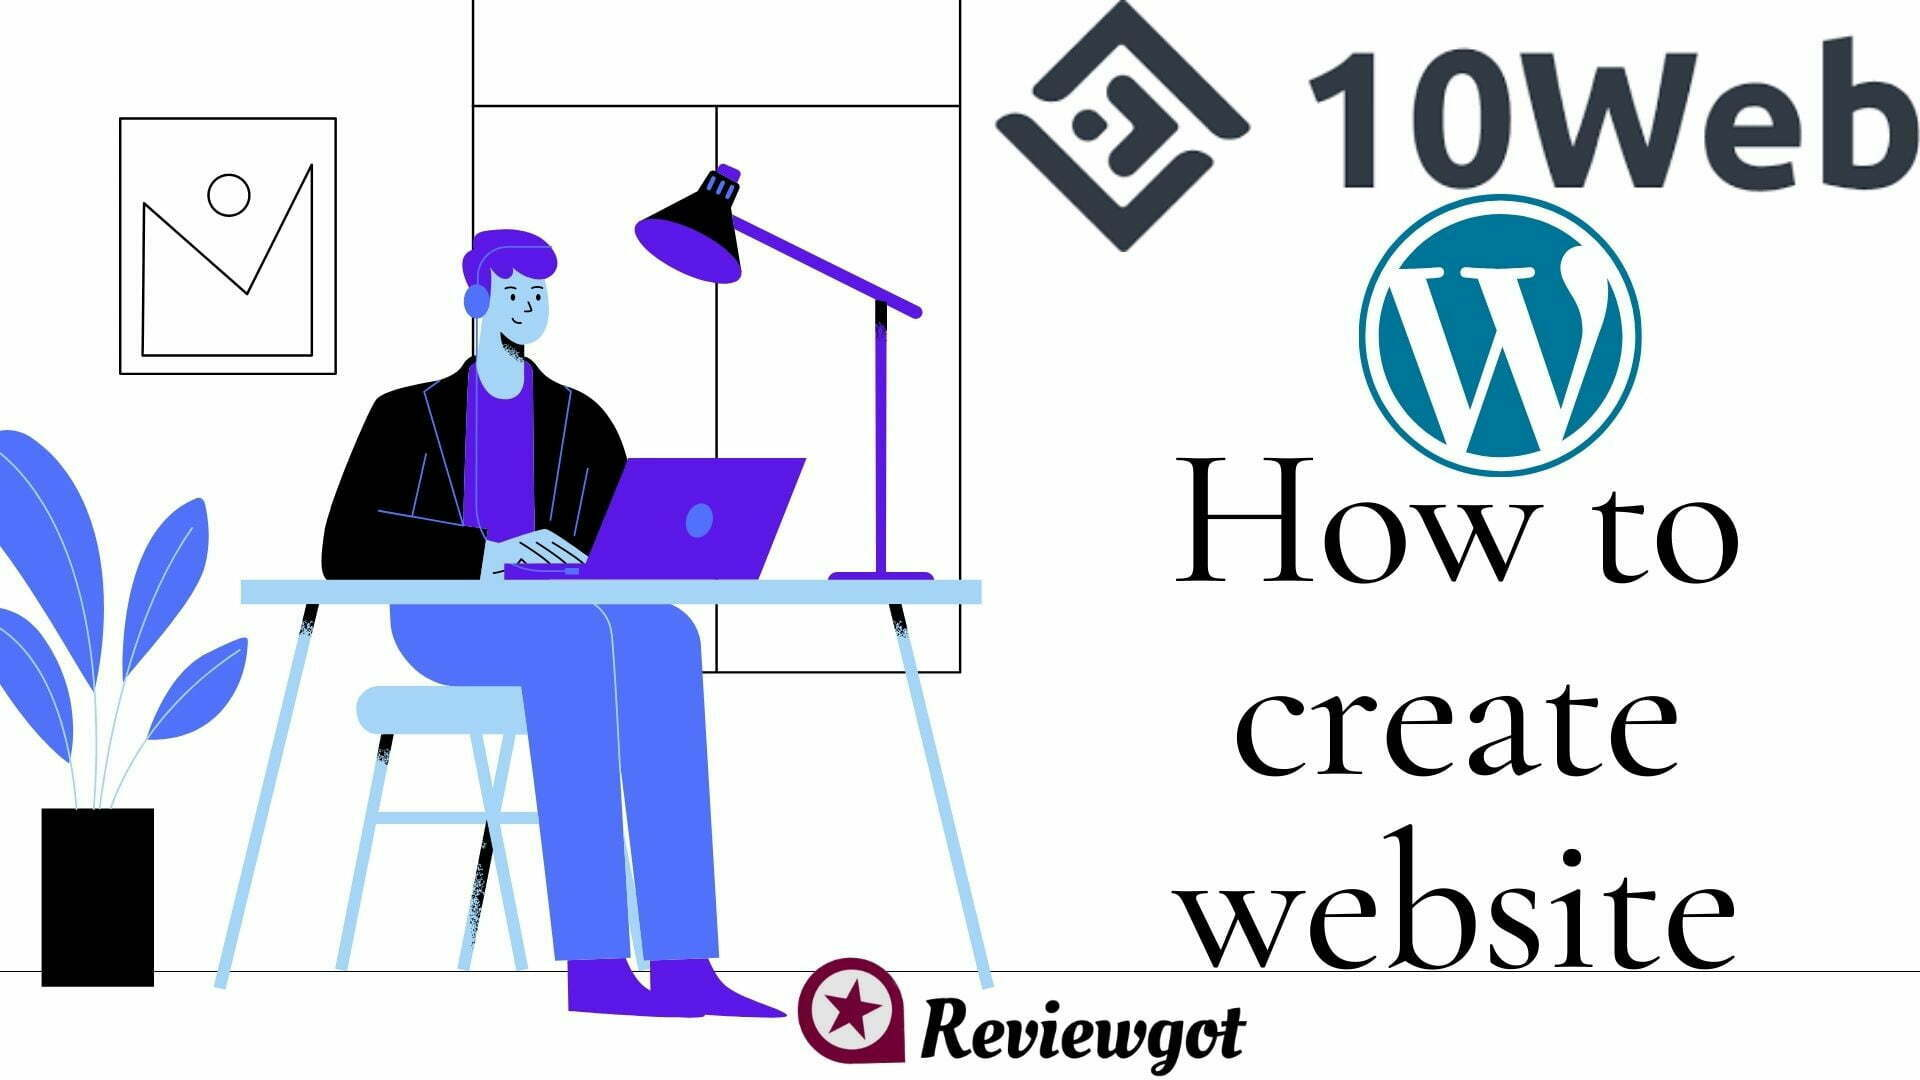 How to Create Wordpress Website on 10web